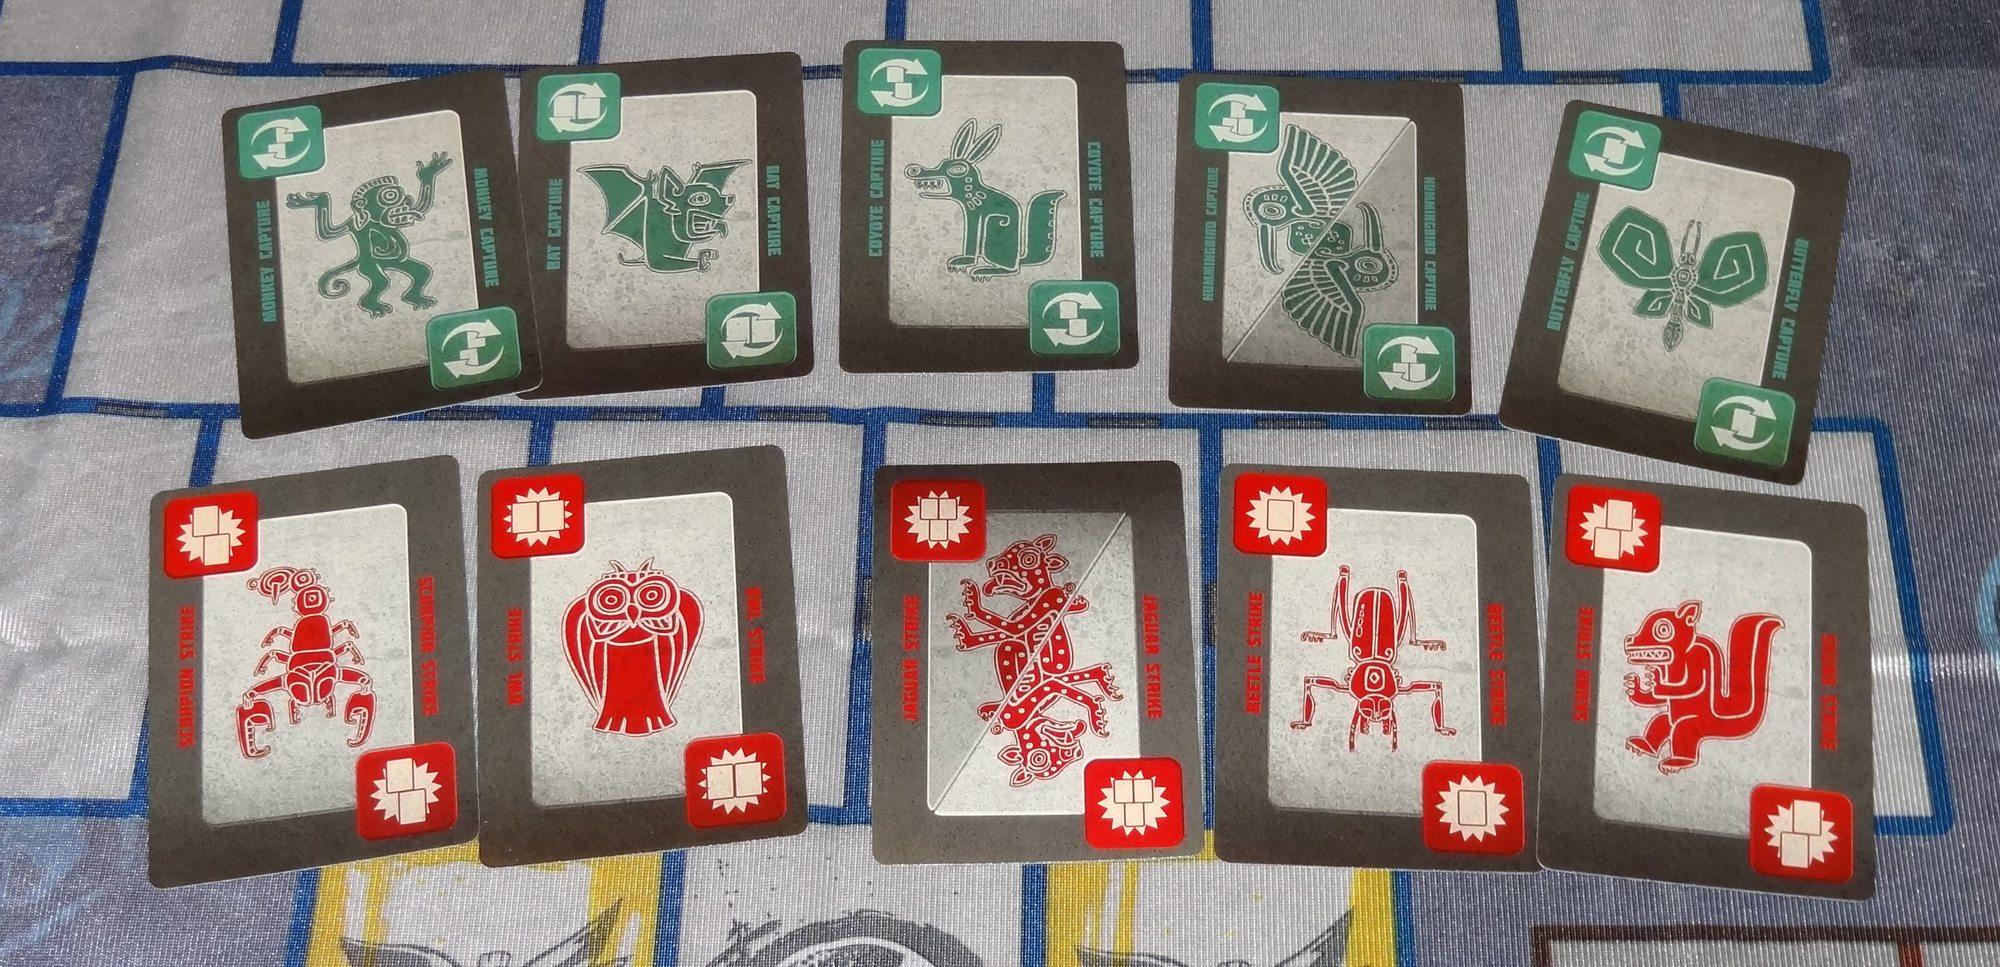 Serpent Stones cards